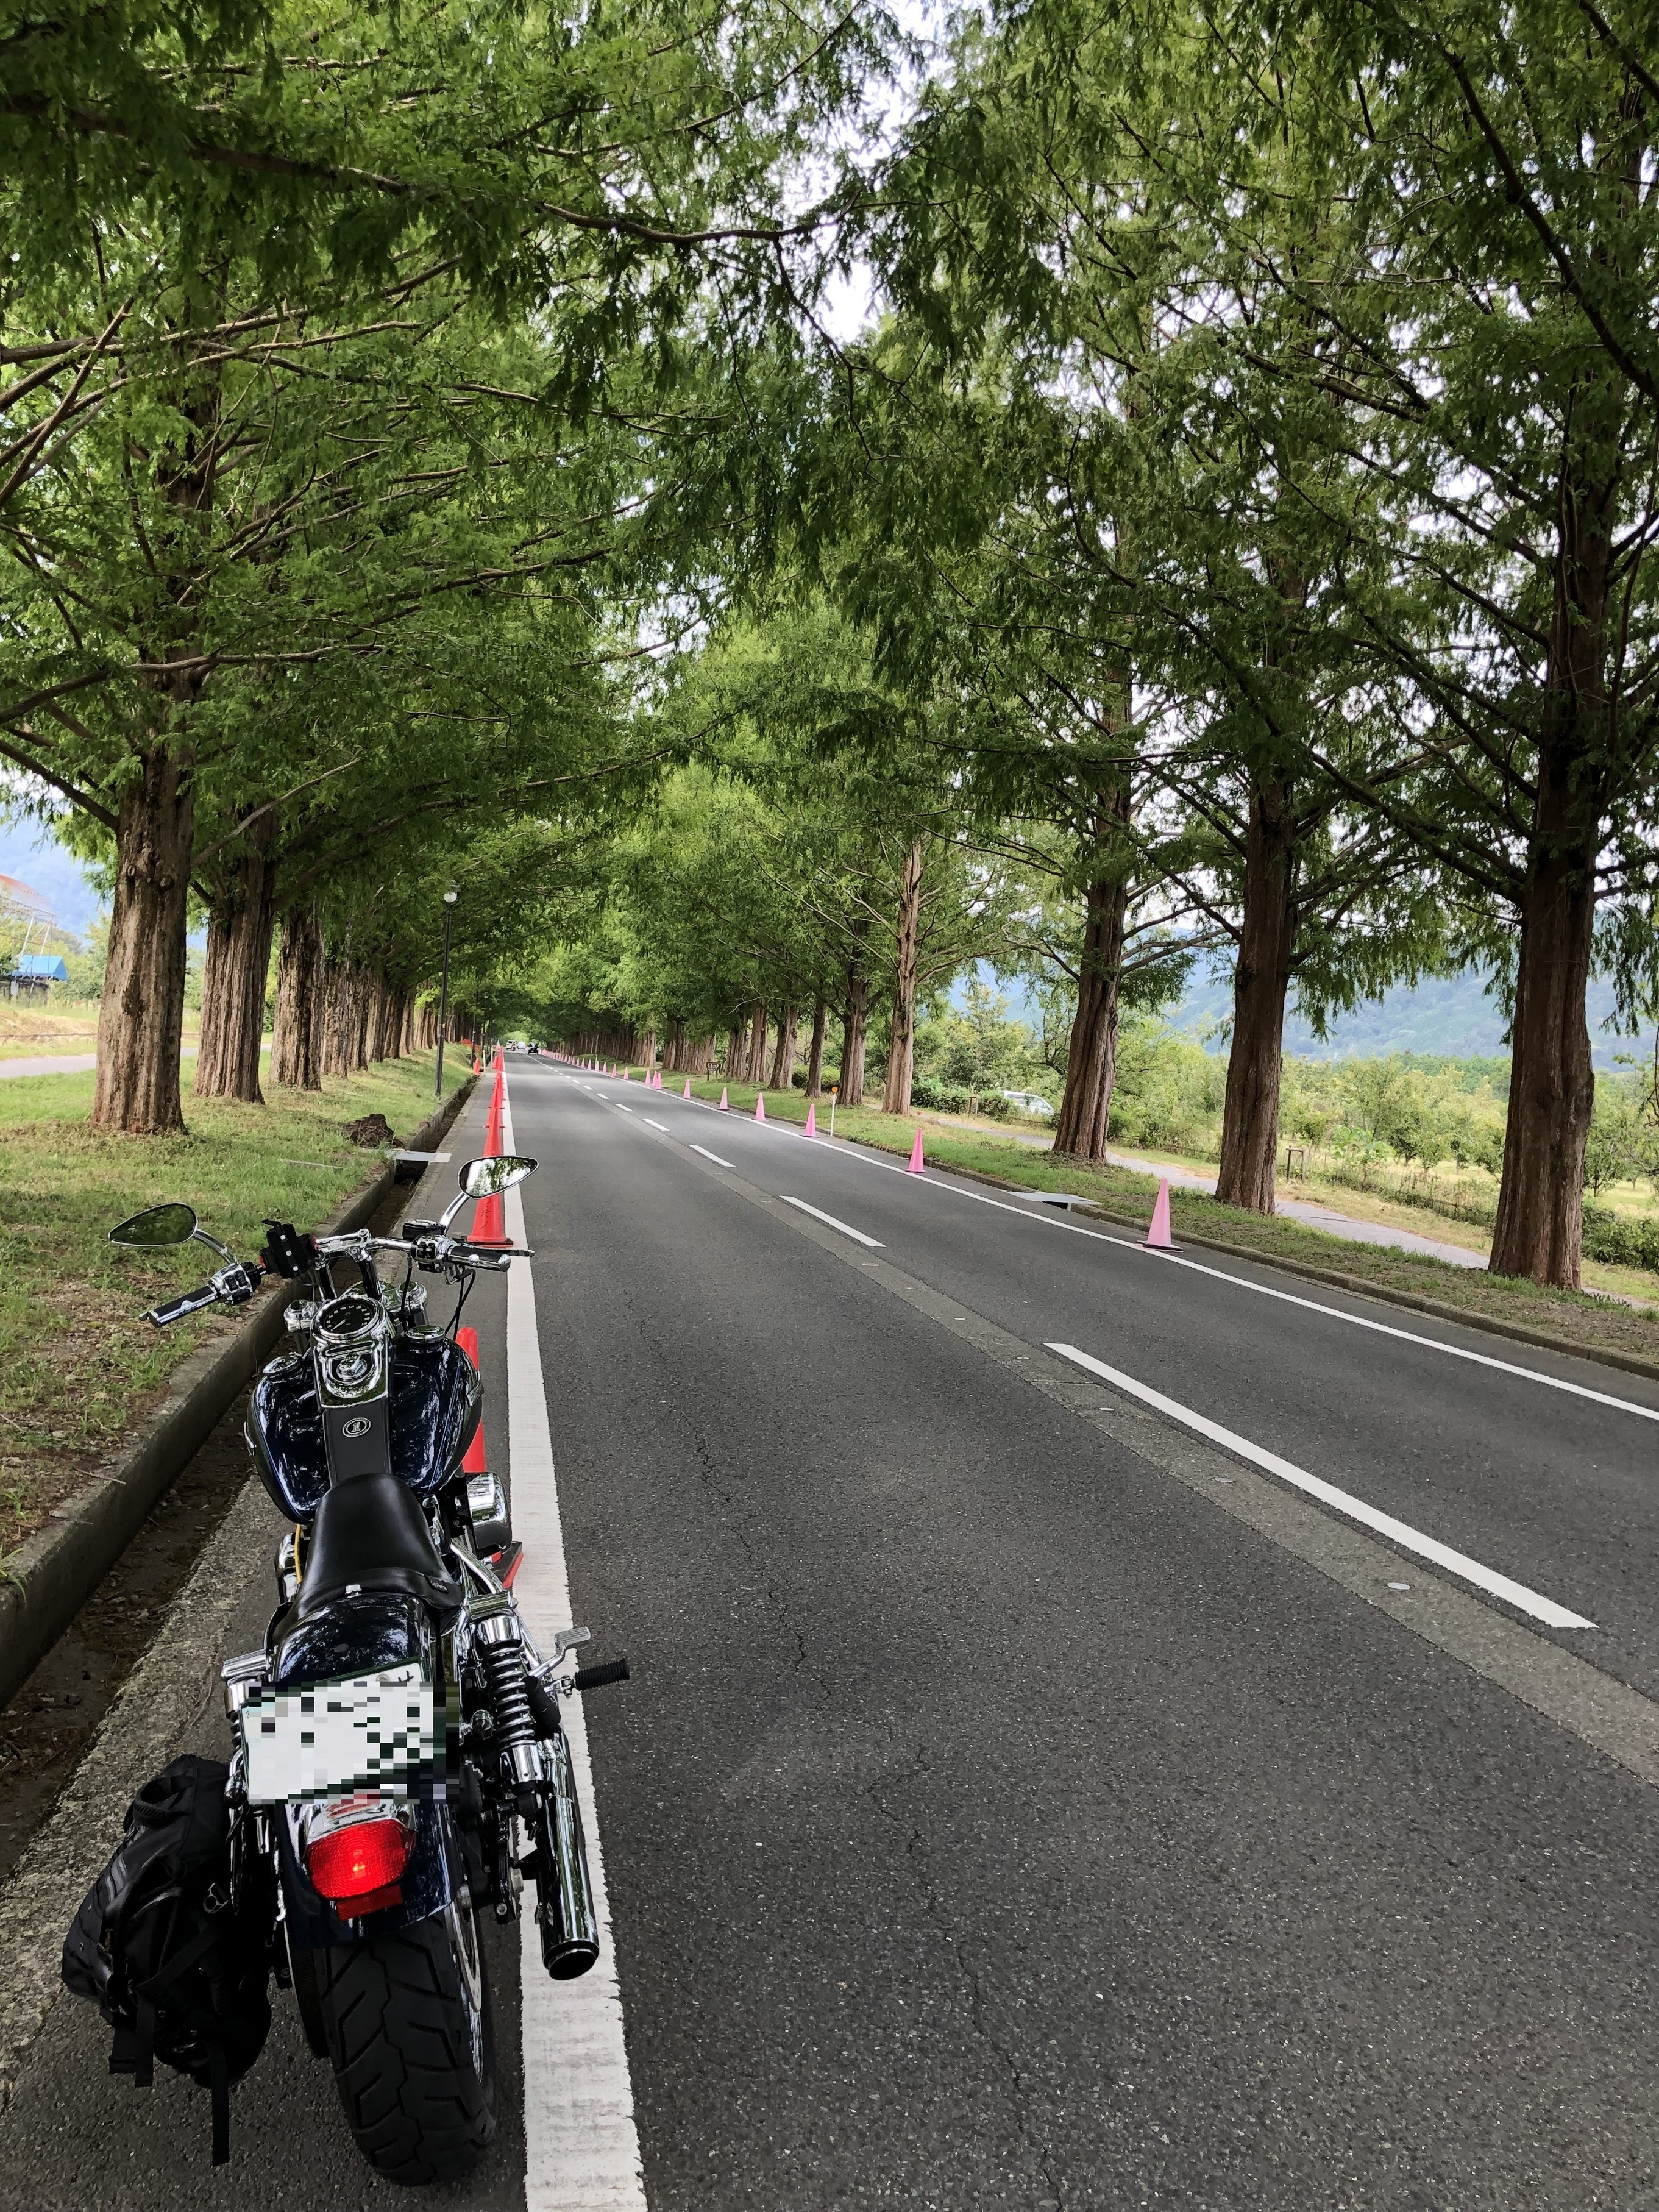 motorcycle-touring-harleydavidson-metasequoia-row-of-trees-superb-view-2.jpg